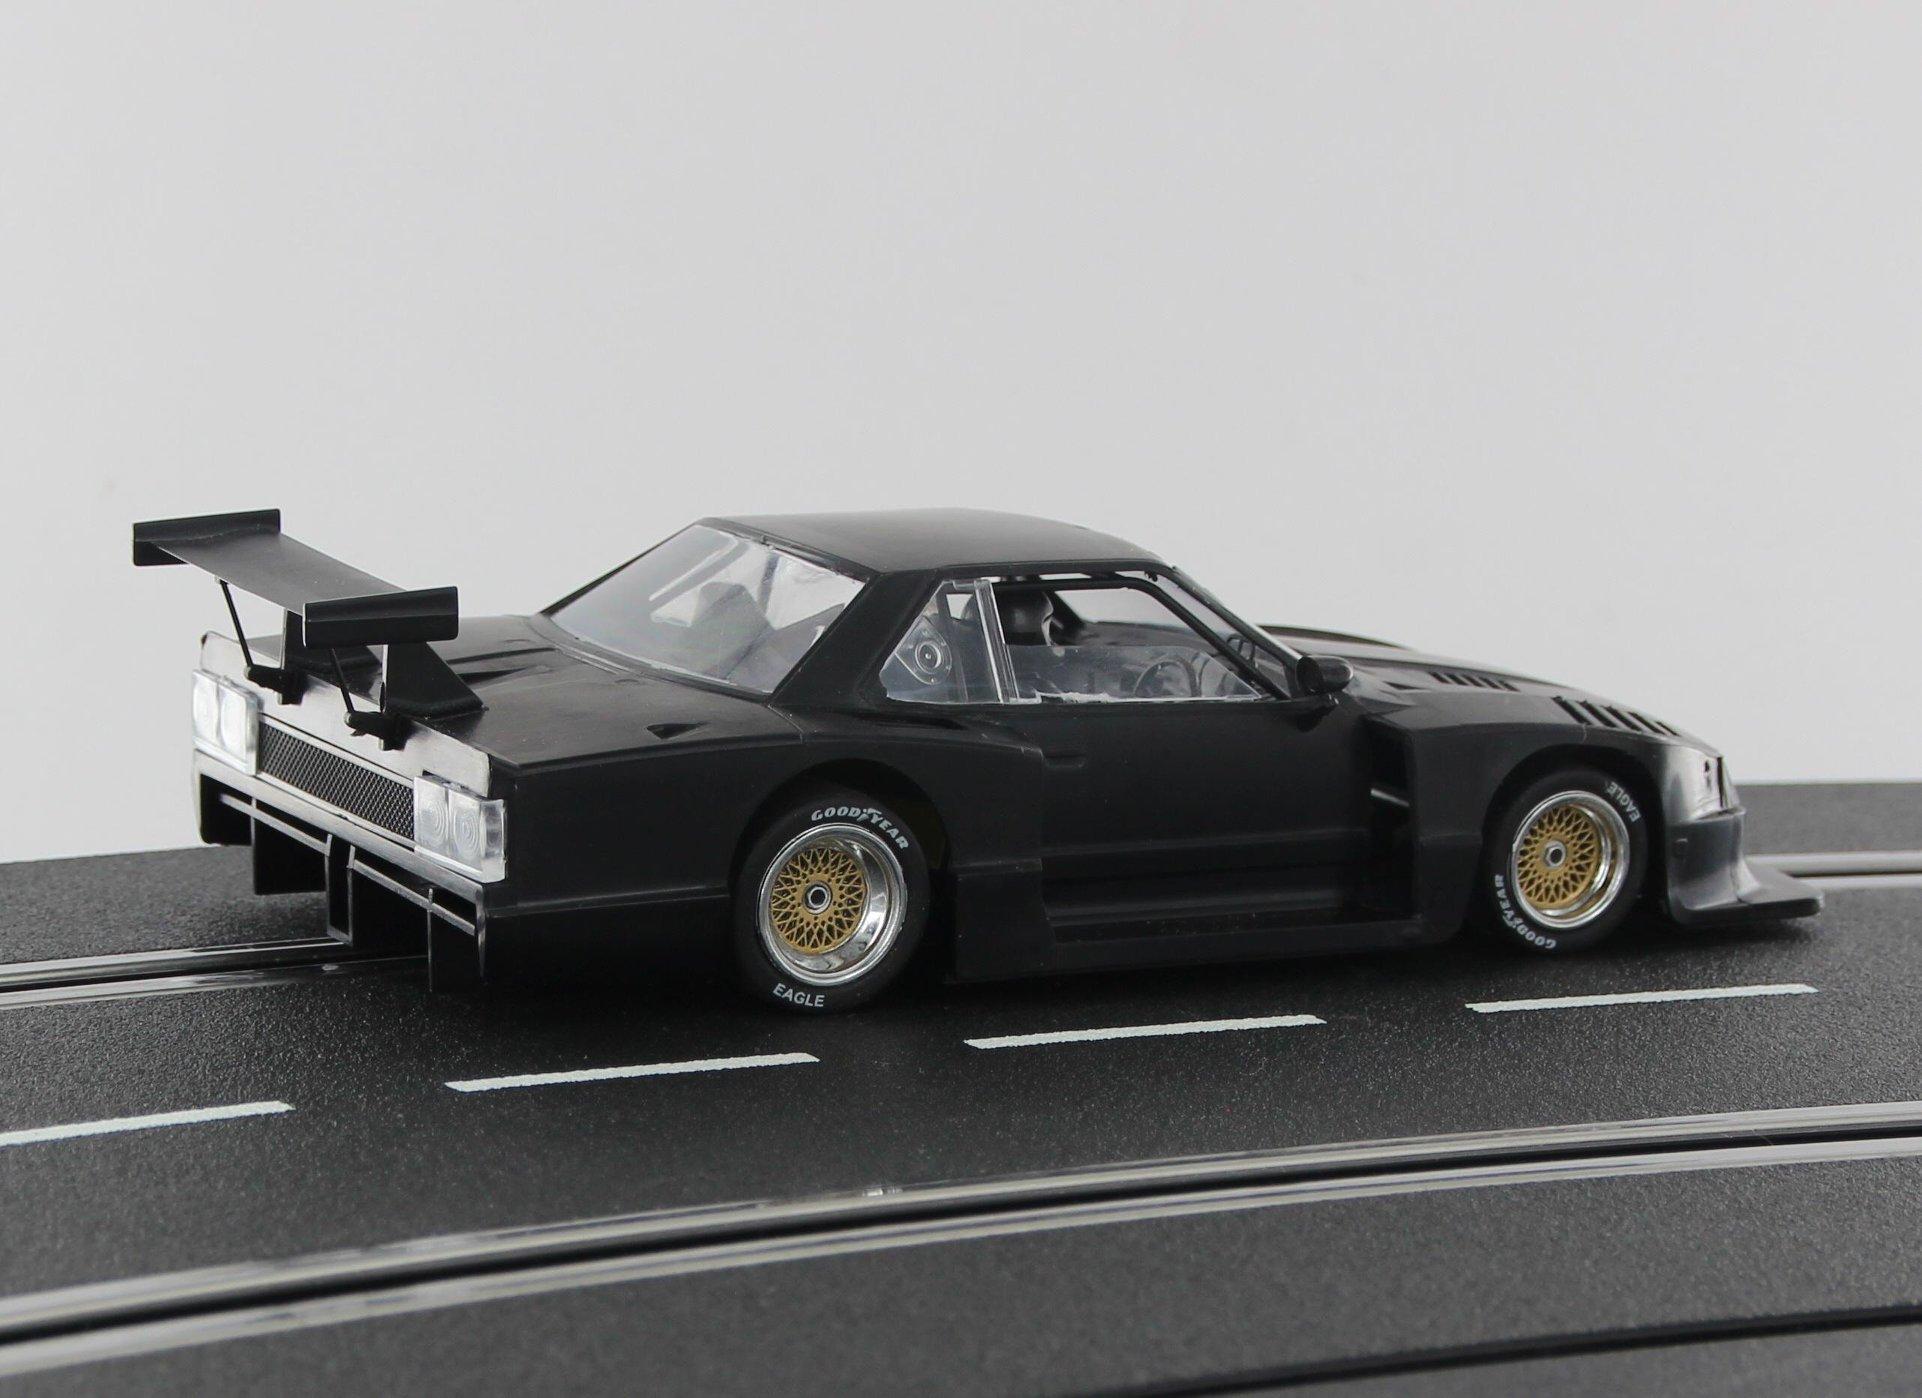 Sideways: Nissan Skyline Turbo Group 5